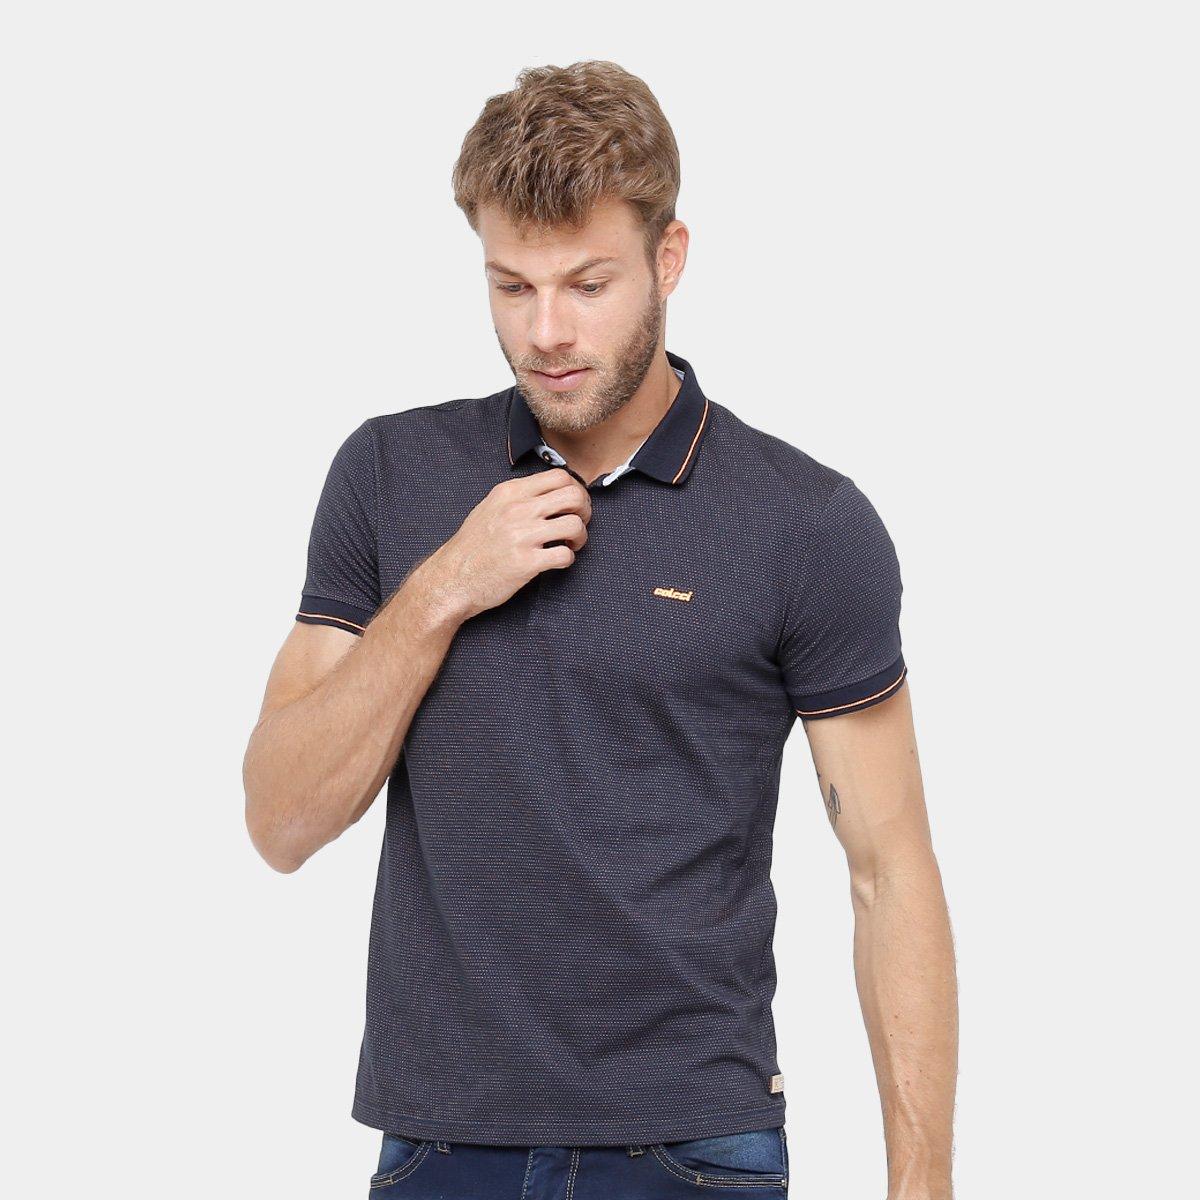 Camisa Polo Colcci Frisos Masculina - Compre Agora  ce0e6c9c719